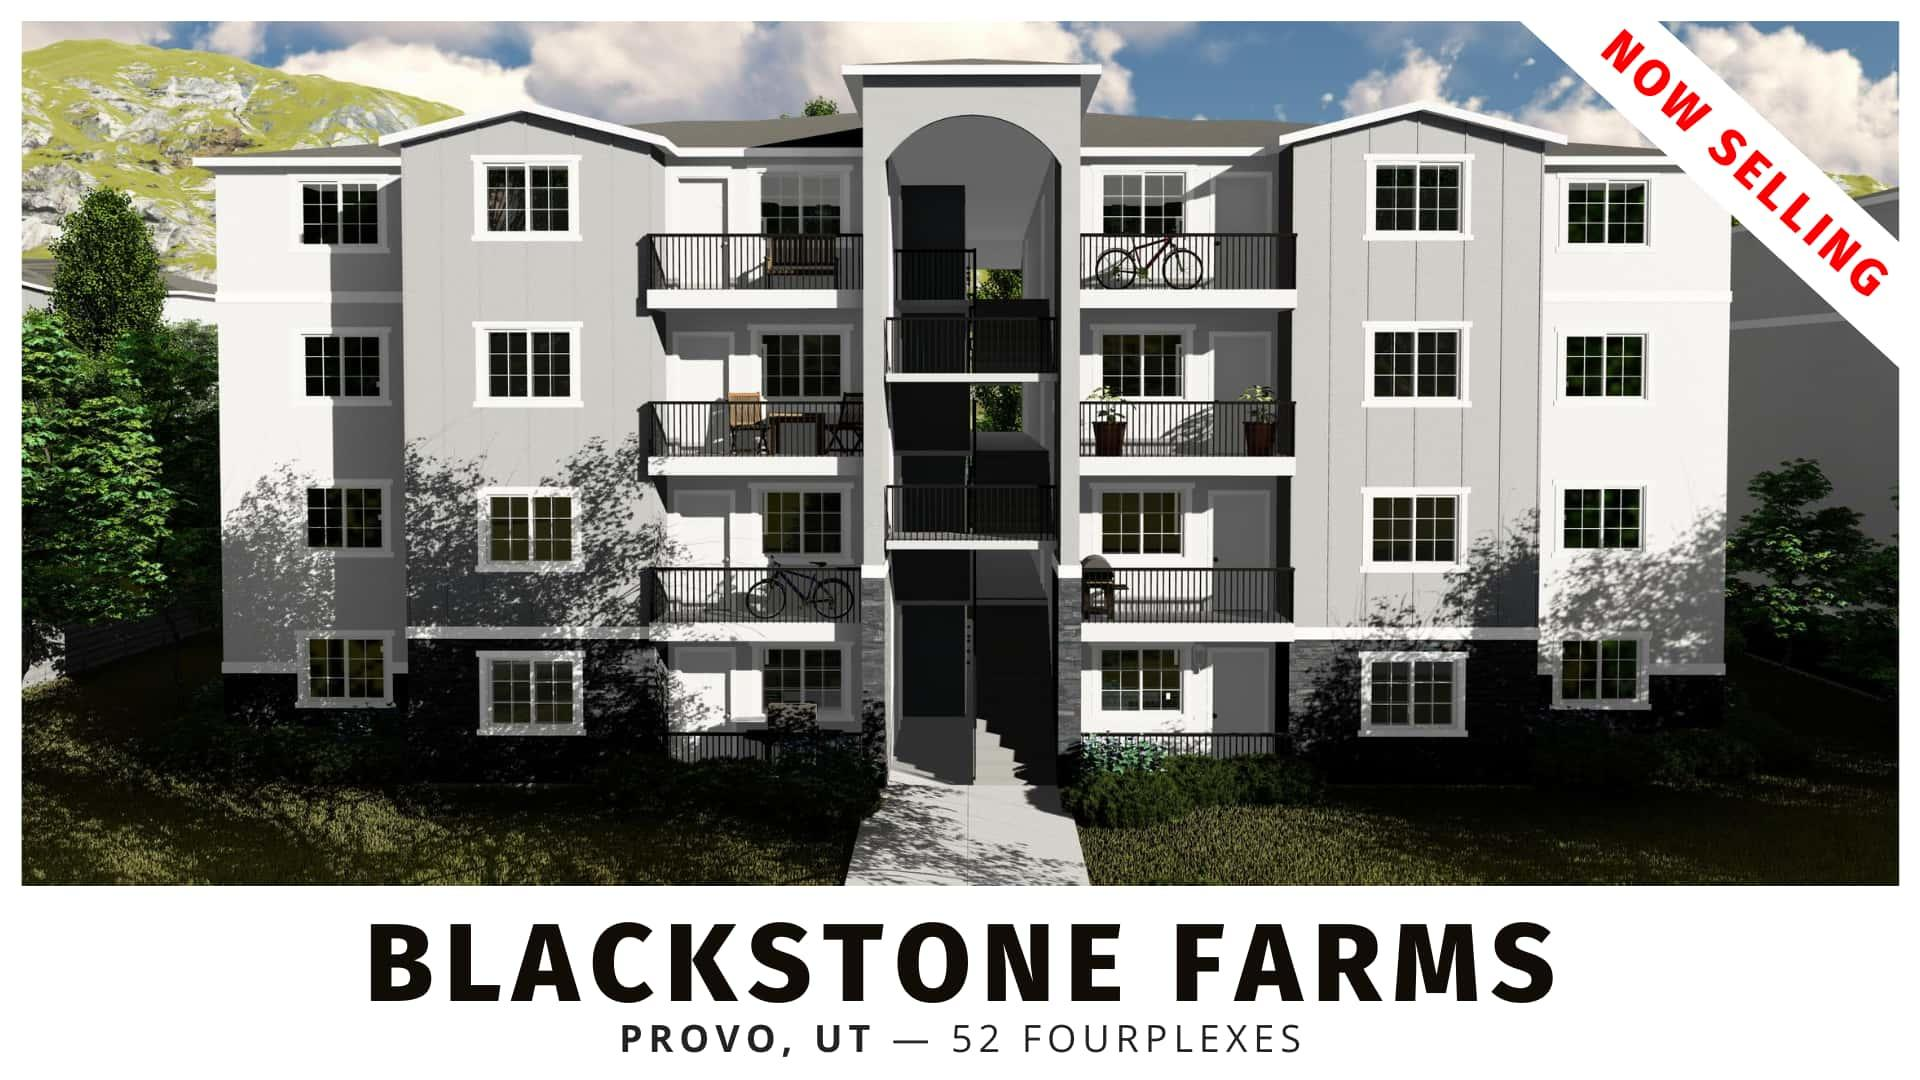 Blackstone Farms Fourplexes for sale in Provo, Utah